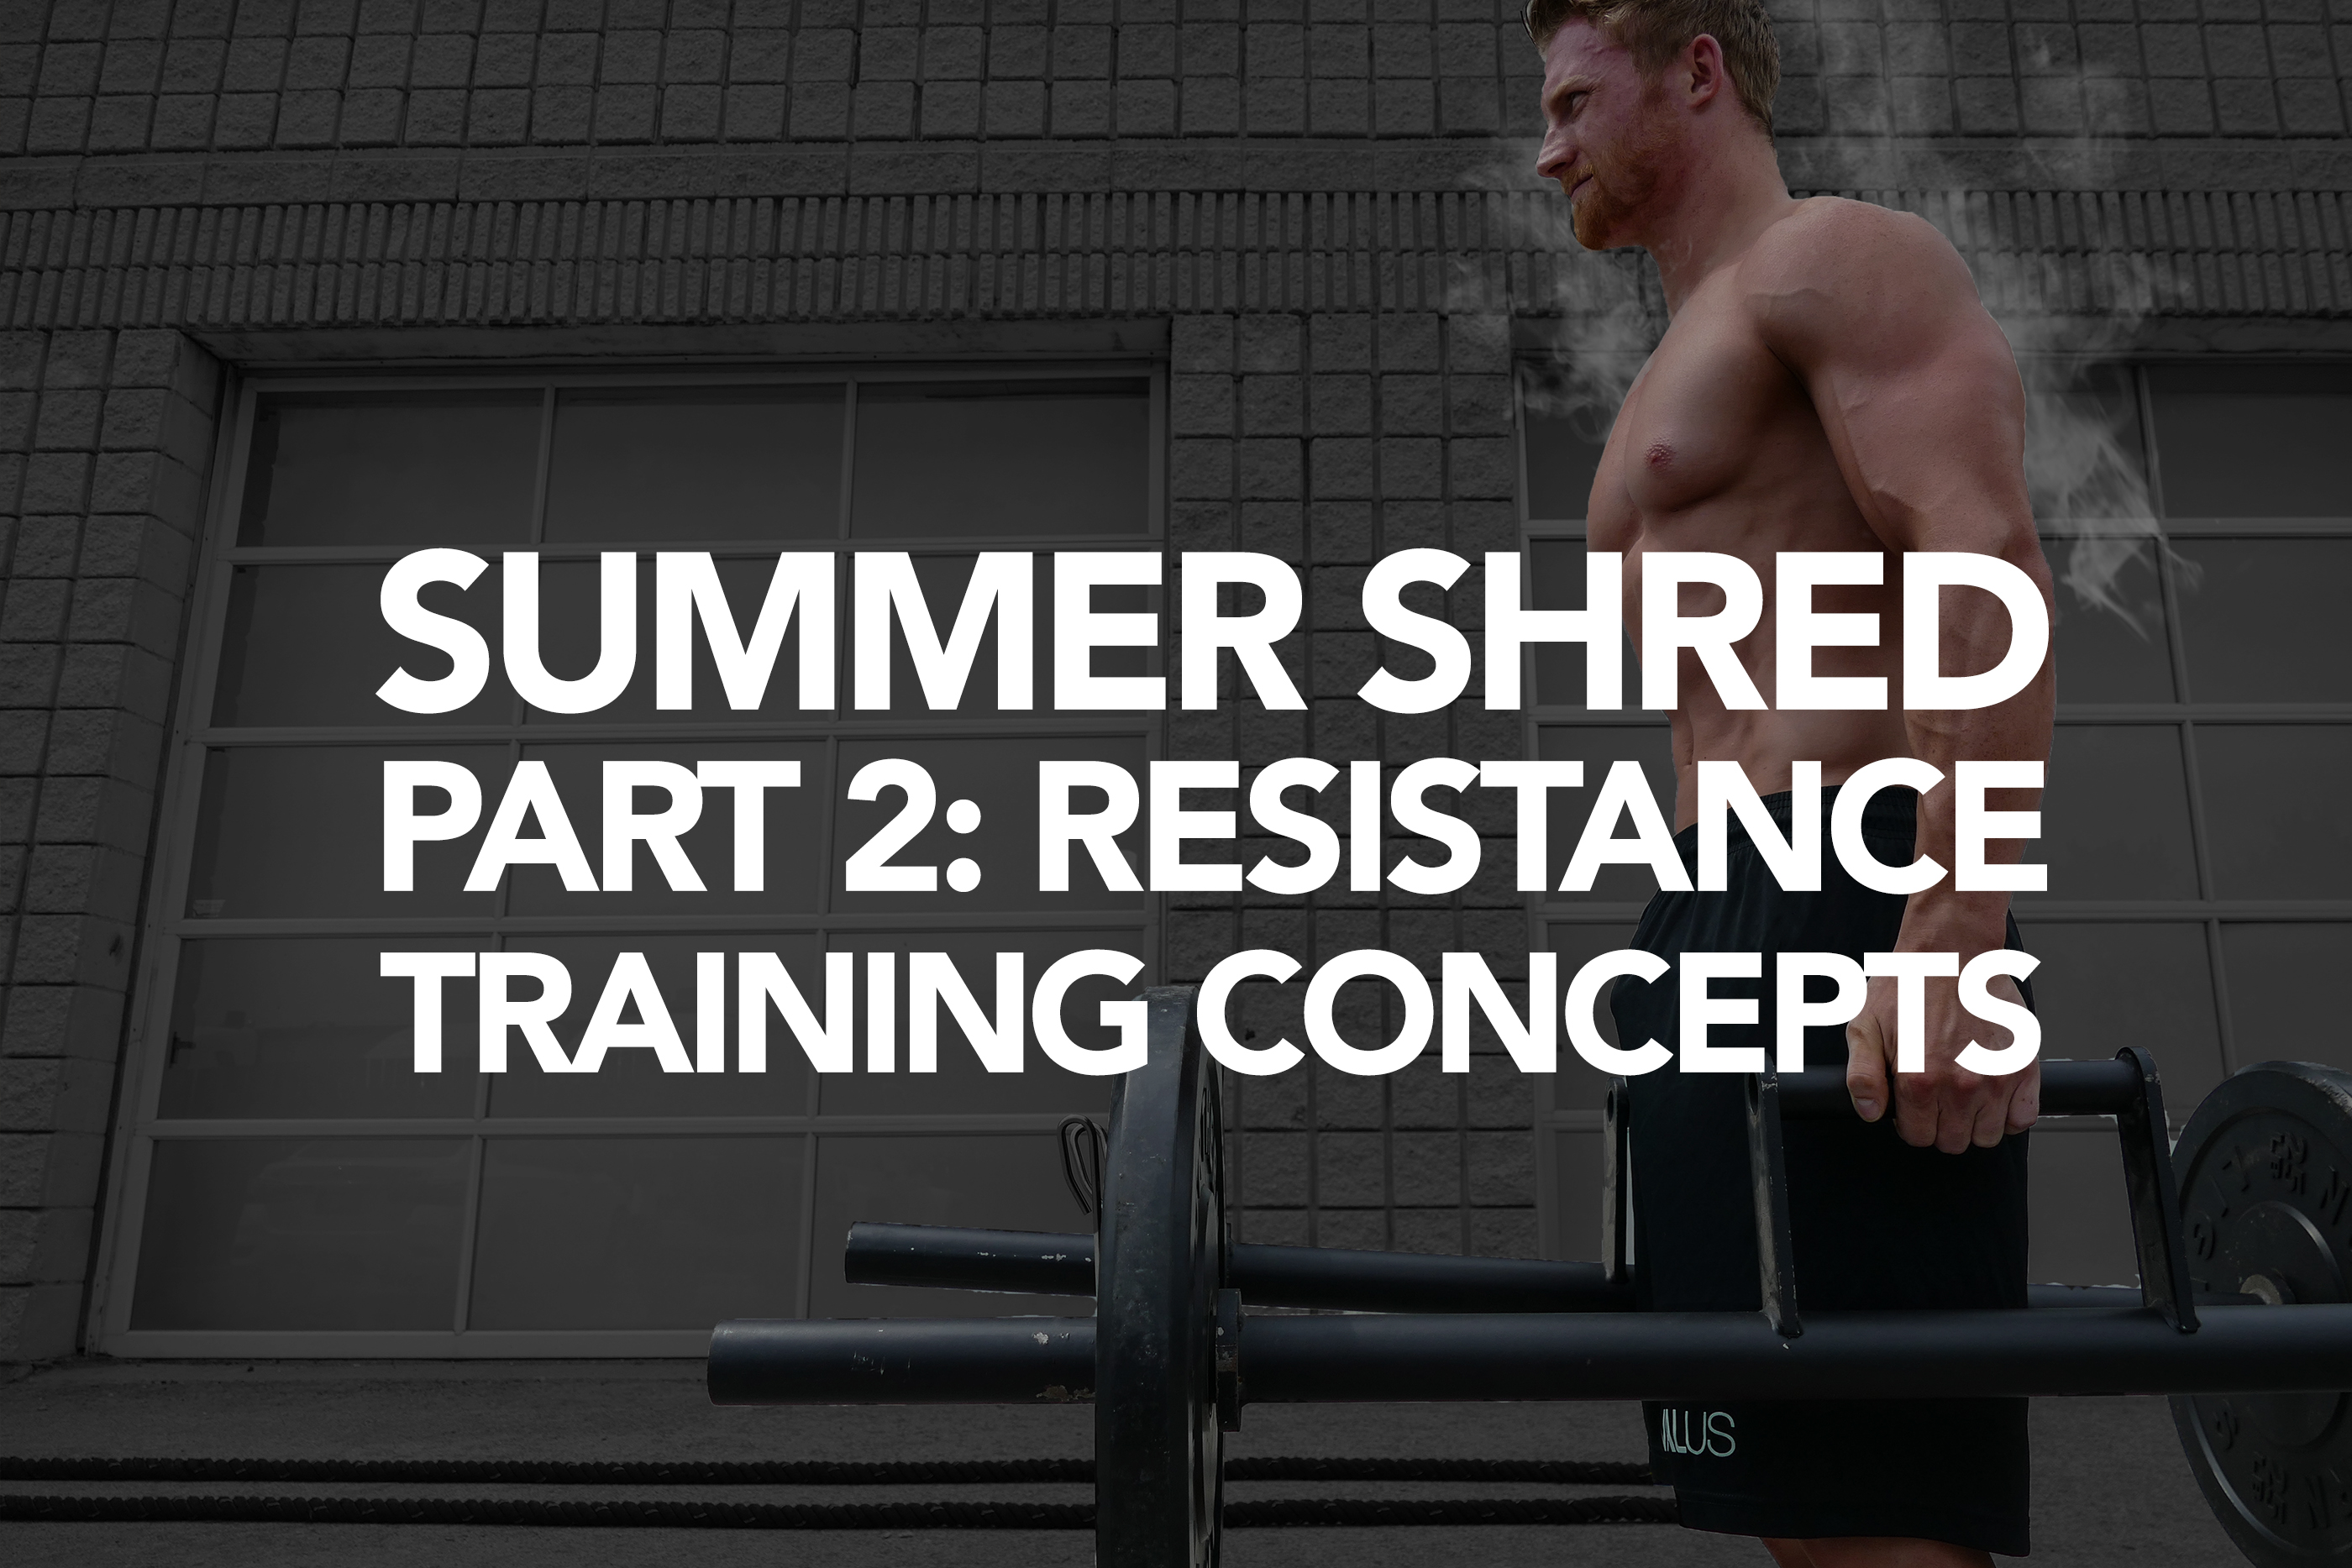 Summer Shredding Part 2: Resistance Training Concepts